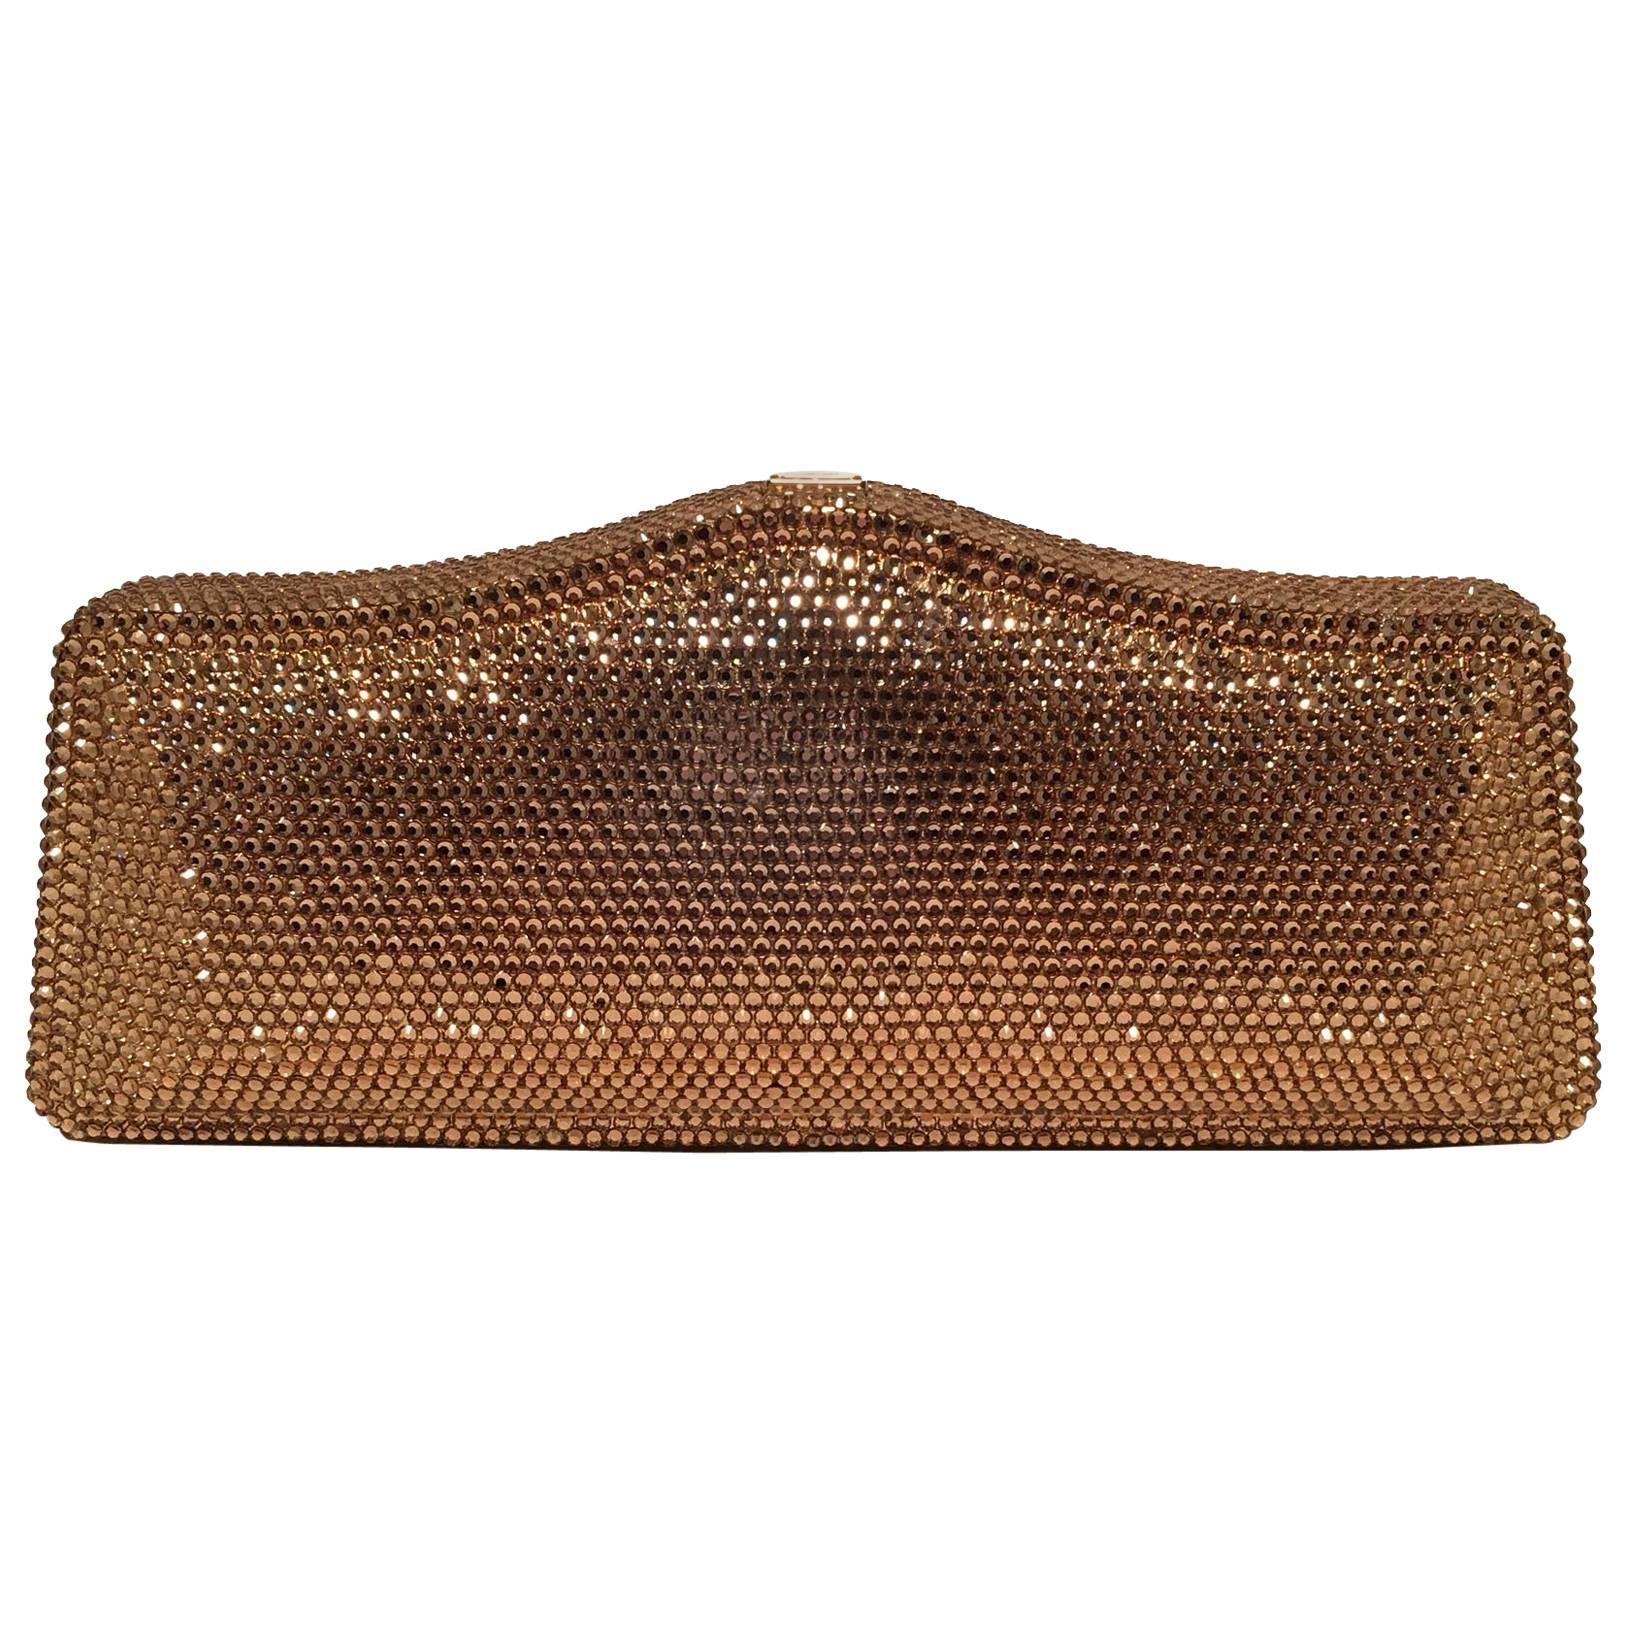 Judith Leiber Gold Swarovski Crystal Evening Bag Minaudiere Clutch